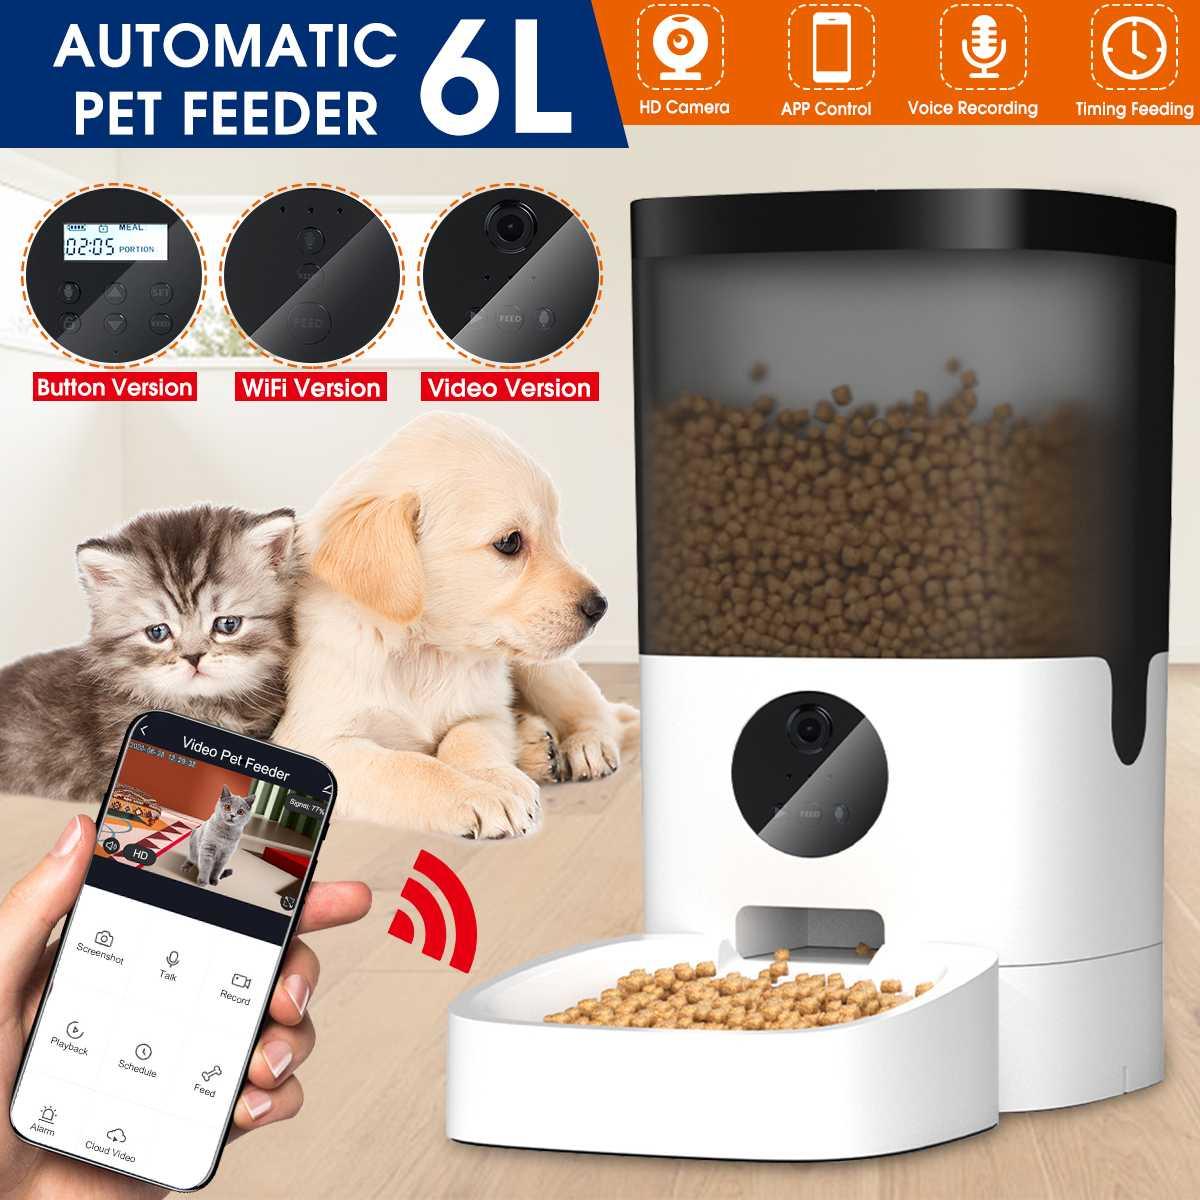 6L Smart Automatic Pet Feeder copertura visibile Pet Dog Cat Food Dispenser telecomando APP Timer [versione Video/WiFi/pulsante] 1